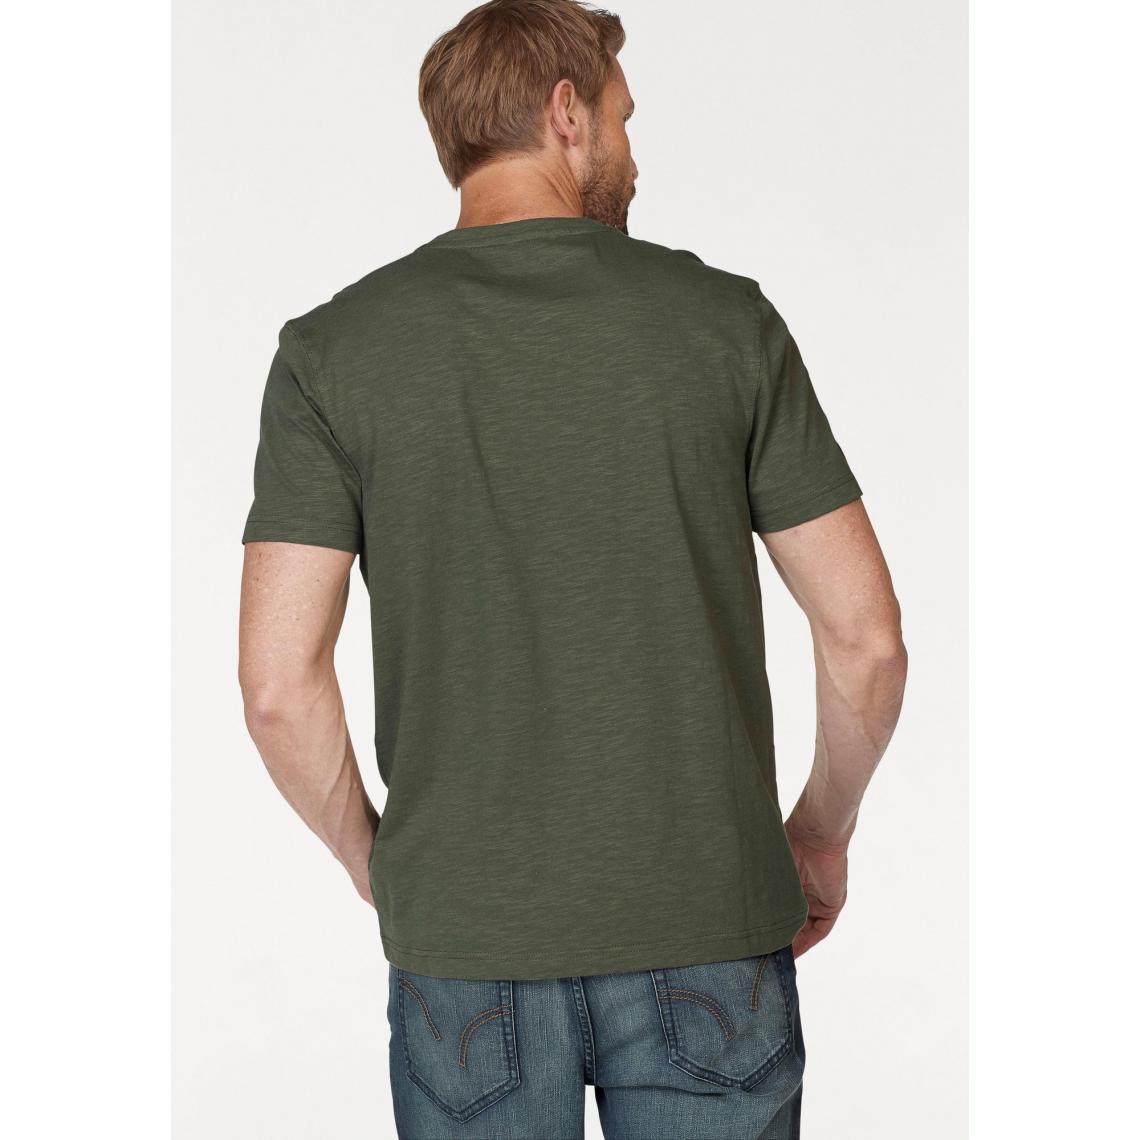 eba89ad97177 T-shirt col tunisien manches courtes homme Arizona - Vert Olive